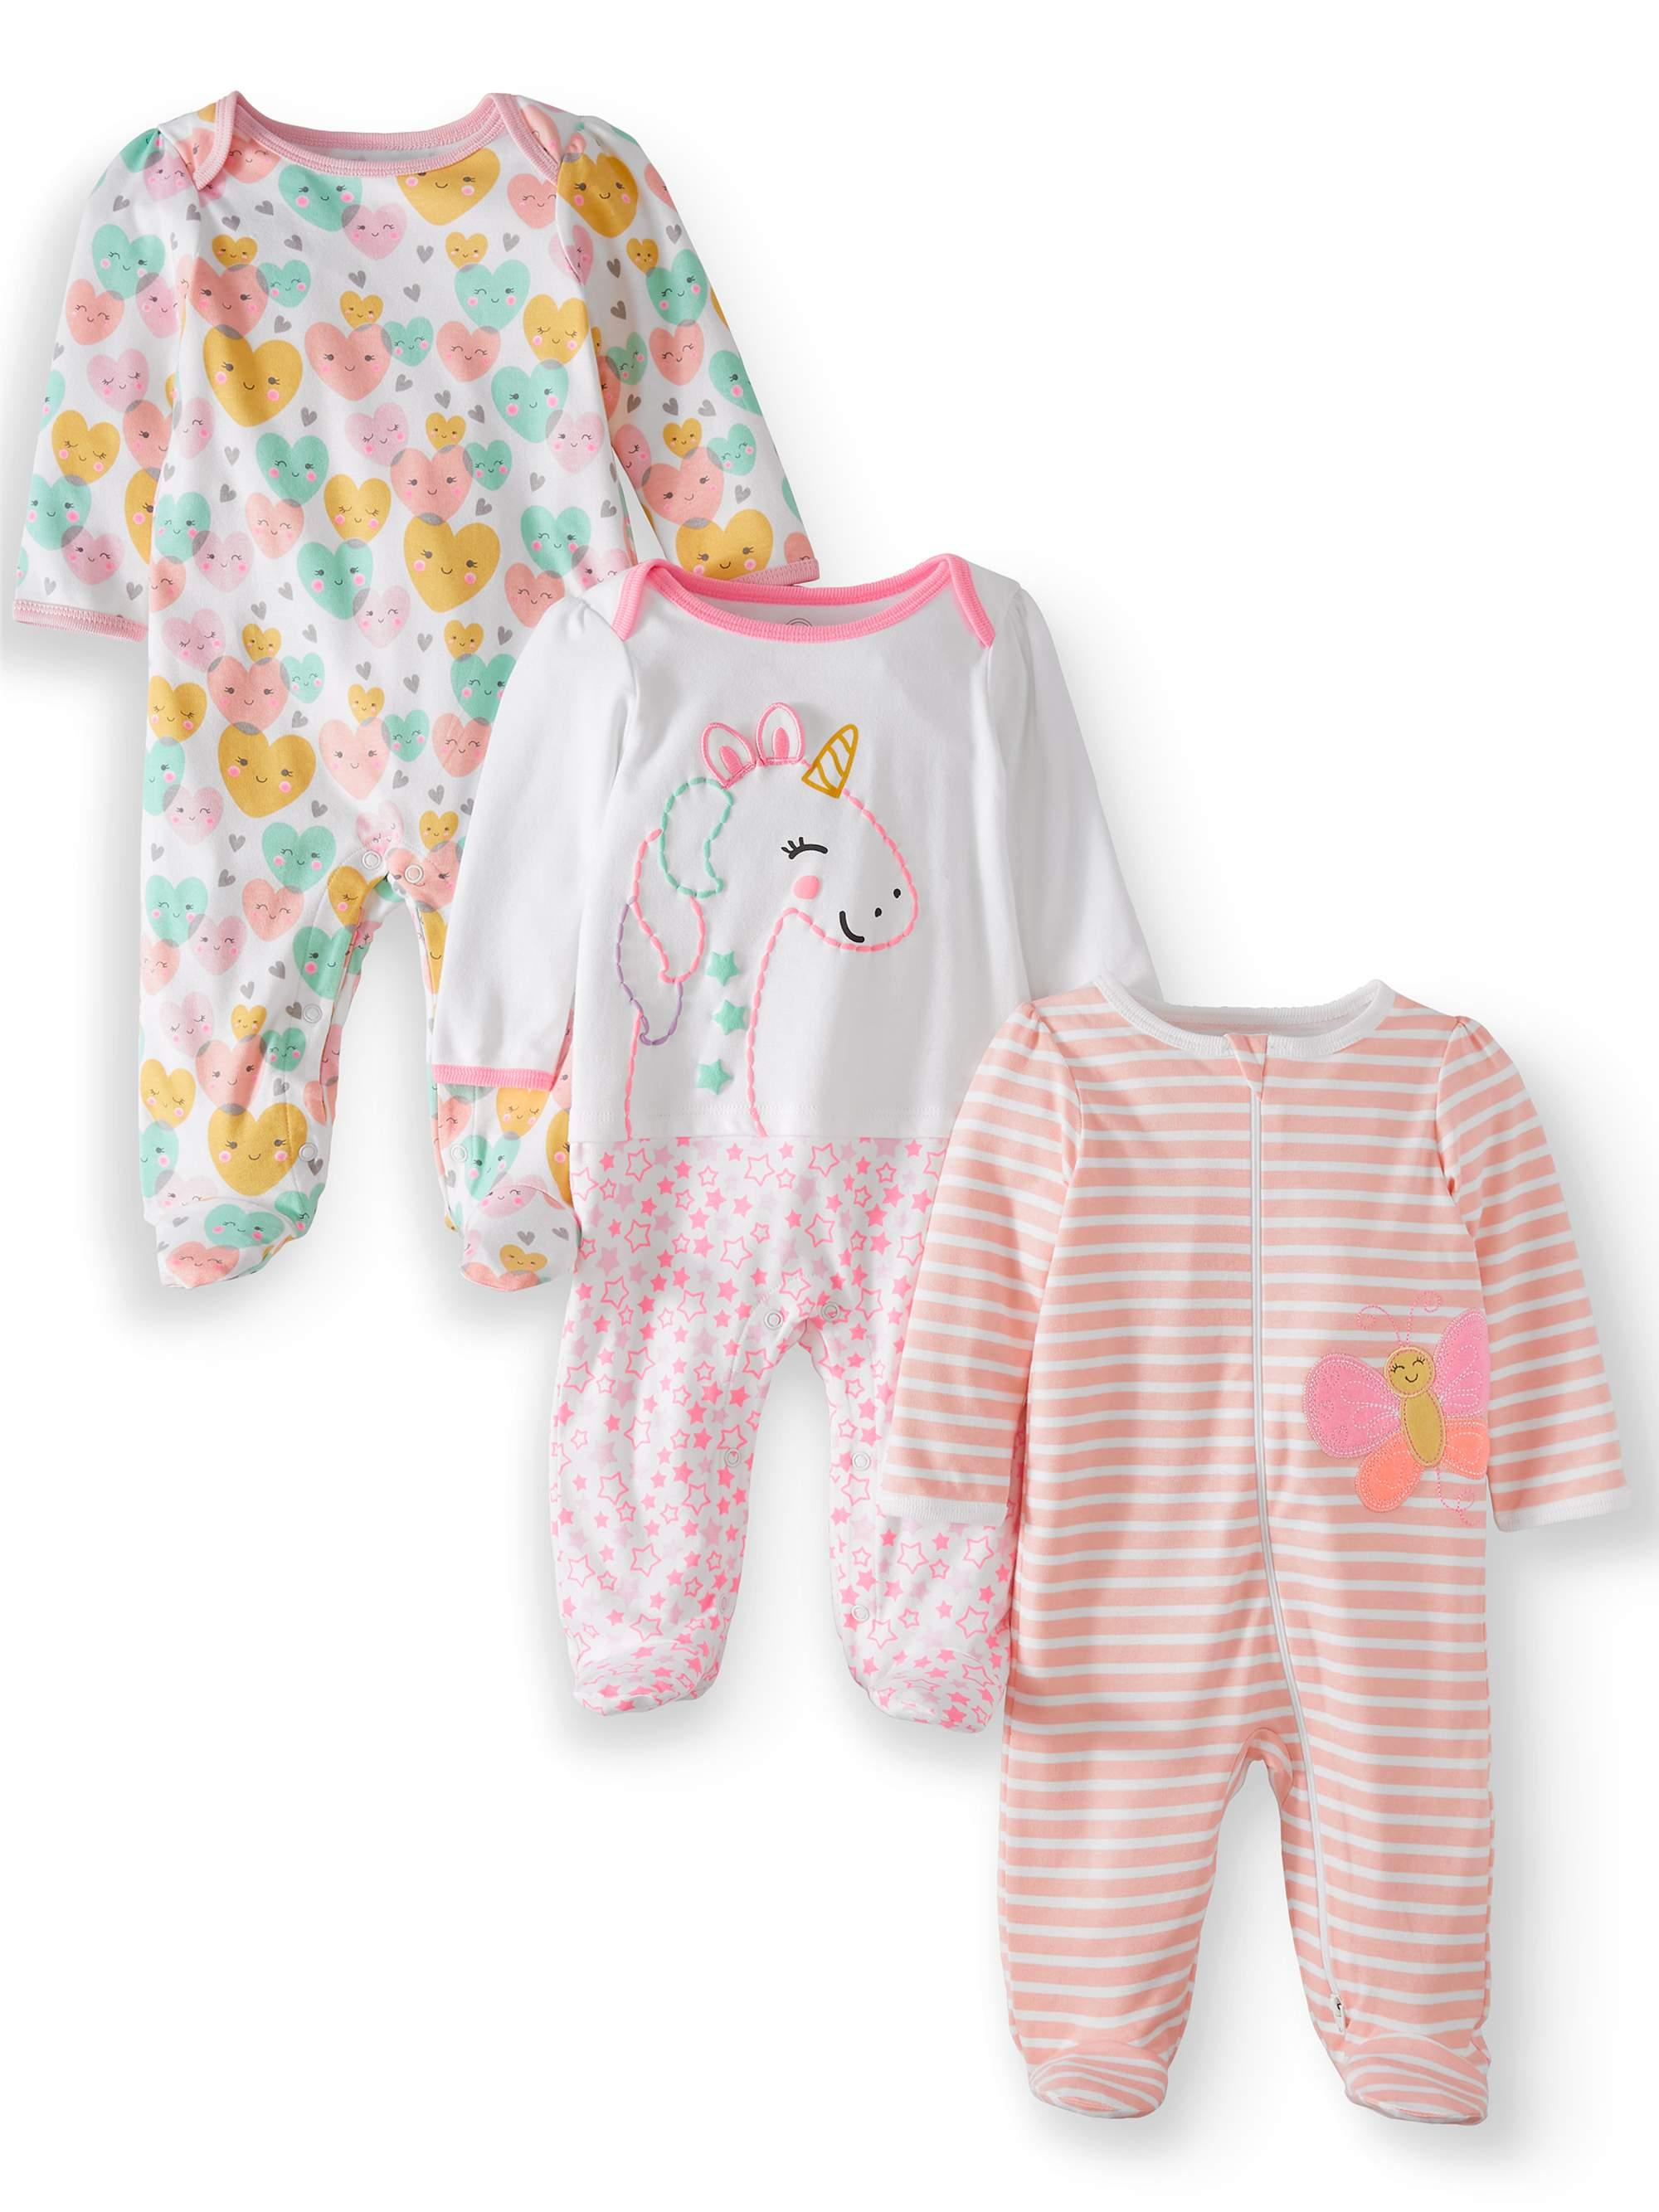 Inverted Zipper Sleep N Play & Coveralls, 3pc Pajama Set (Baby Girls)